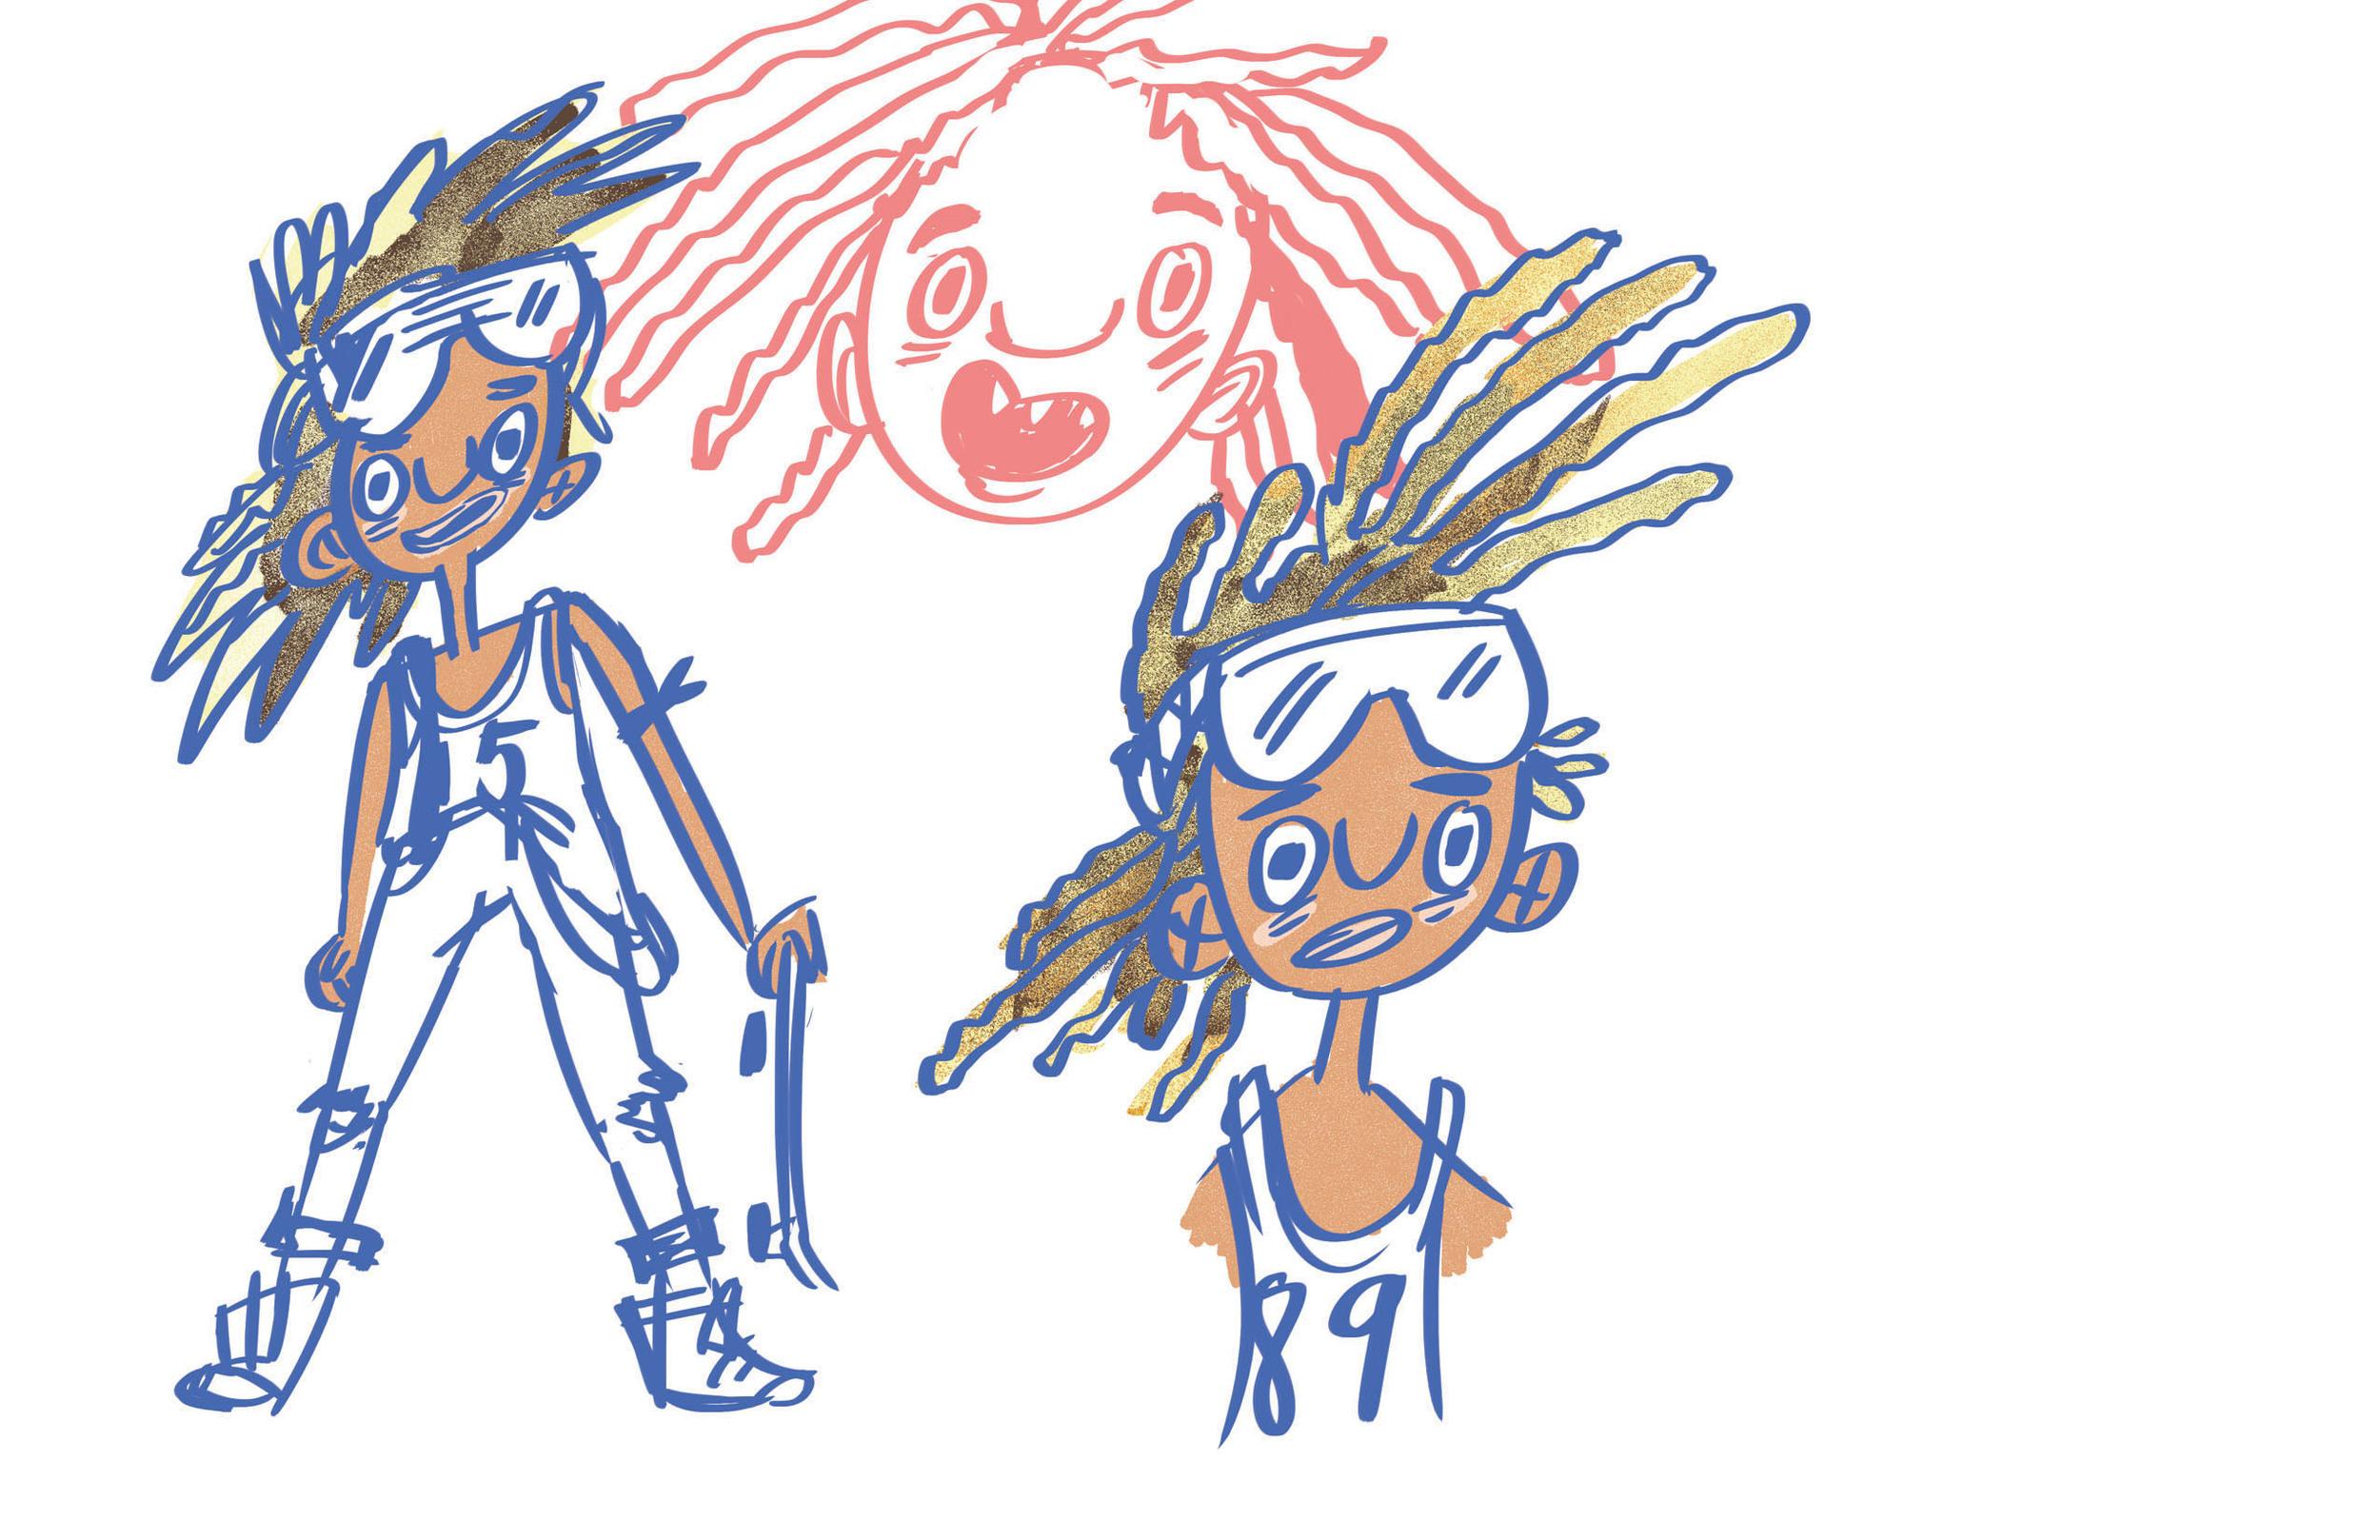 sKate concept sketch